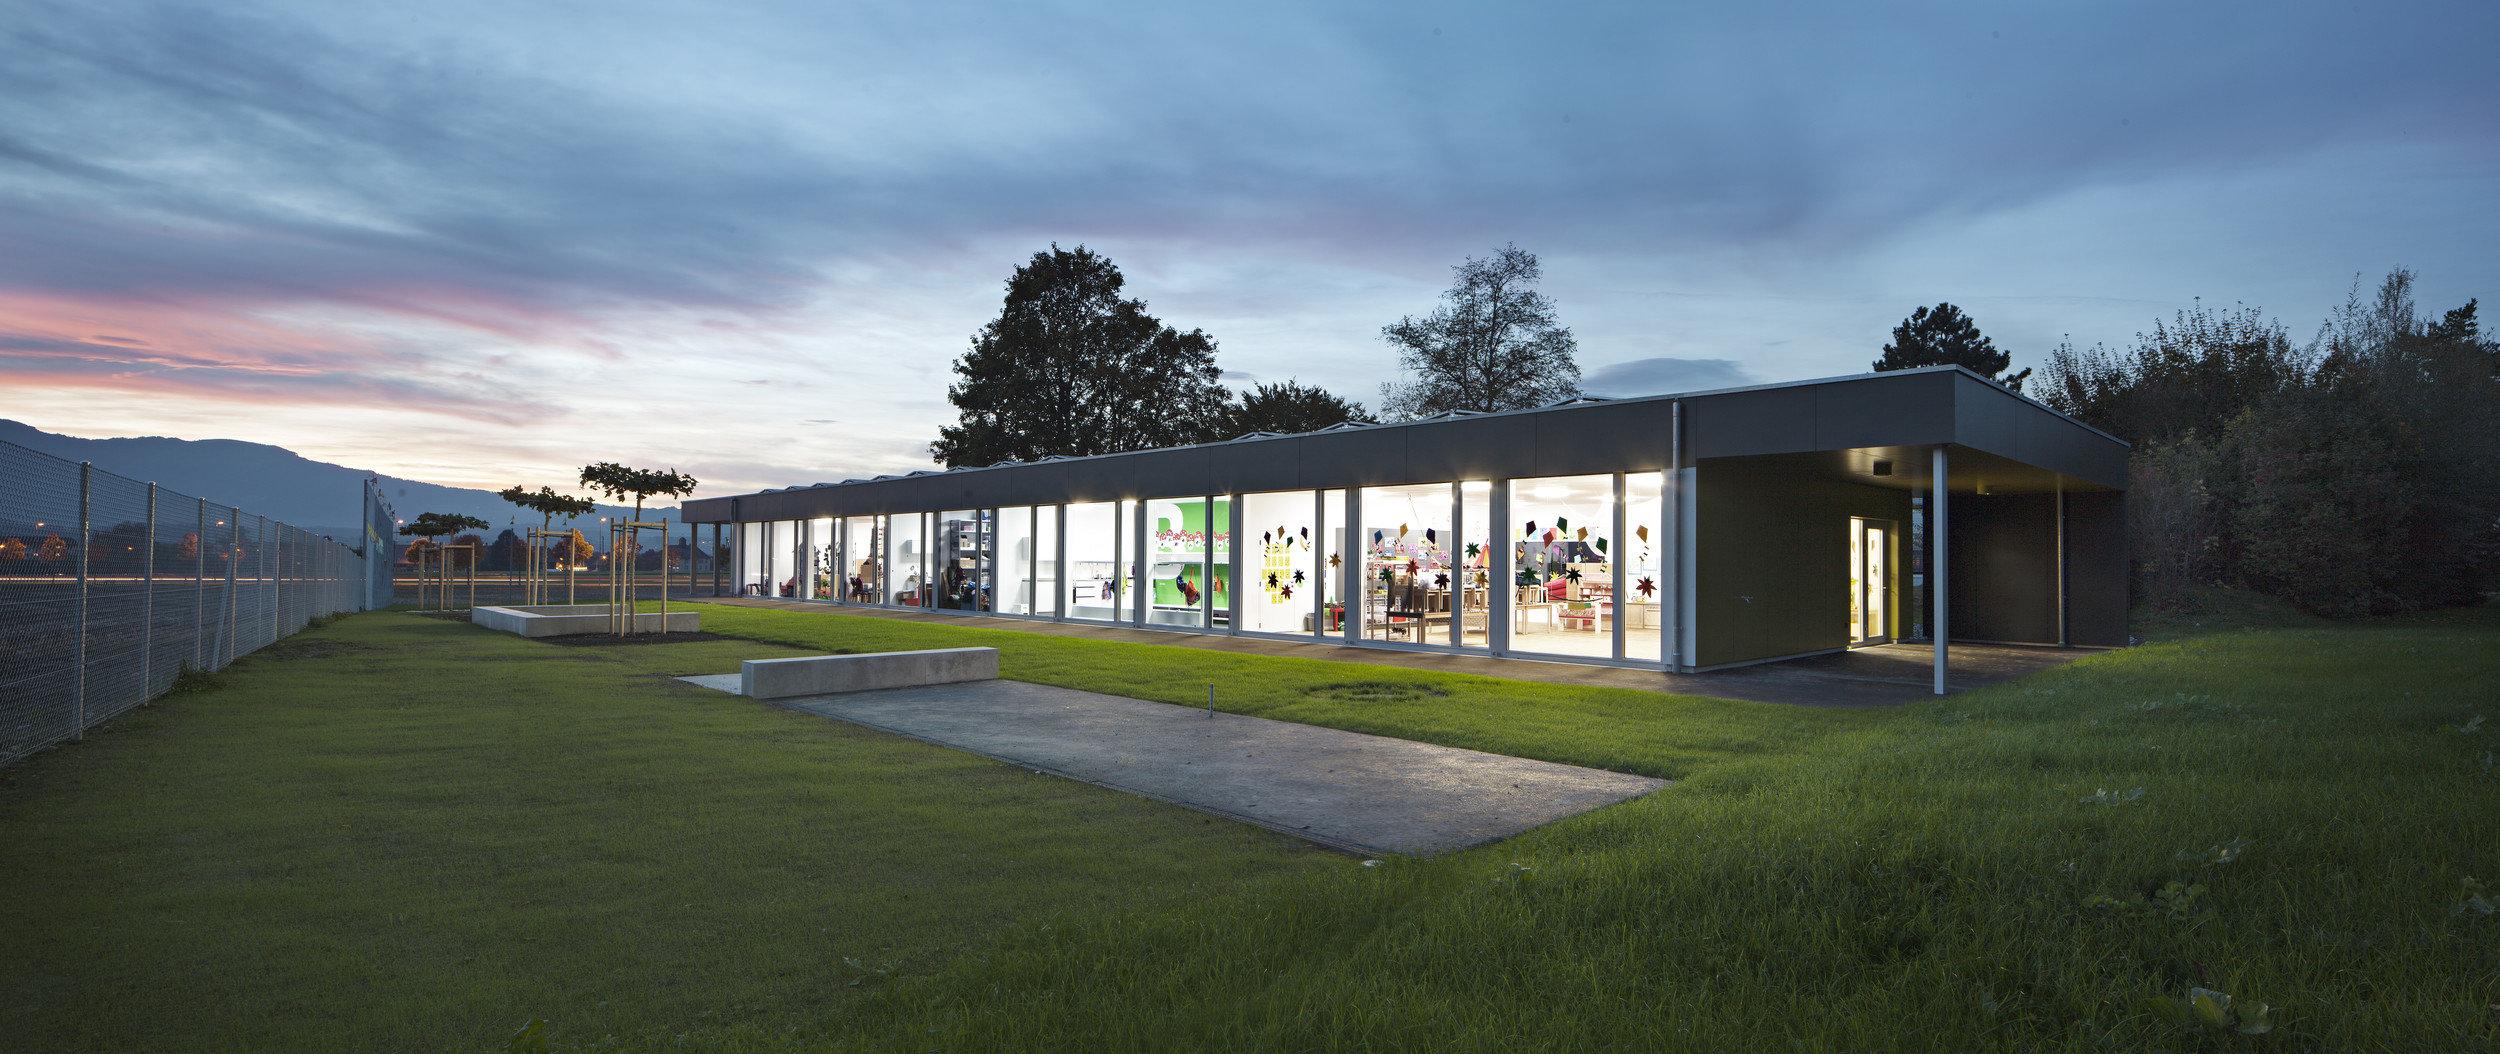 1-geschossiger Kindergarten in Systembauweise mit Fensterfassade